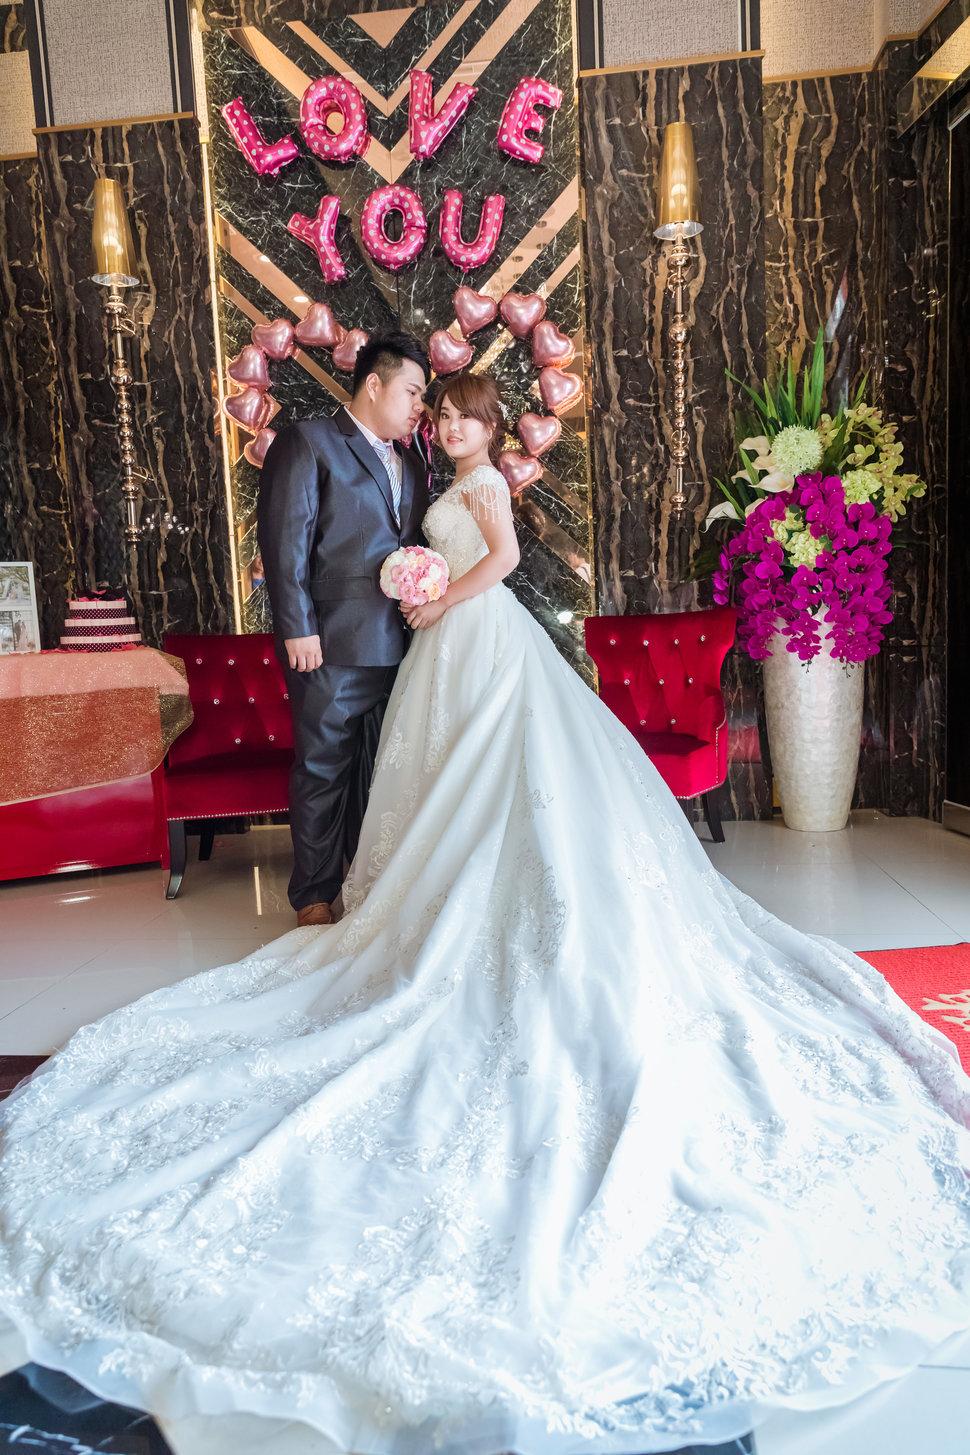 5D4_0160 - Promaker婚禮紀錄攝影團隊婚攝豪哥《結婚吧》